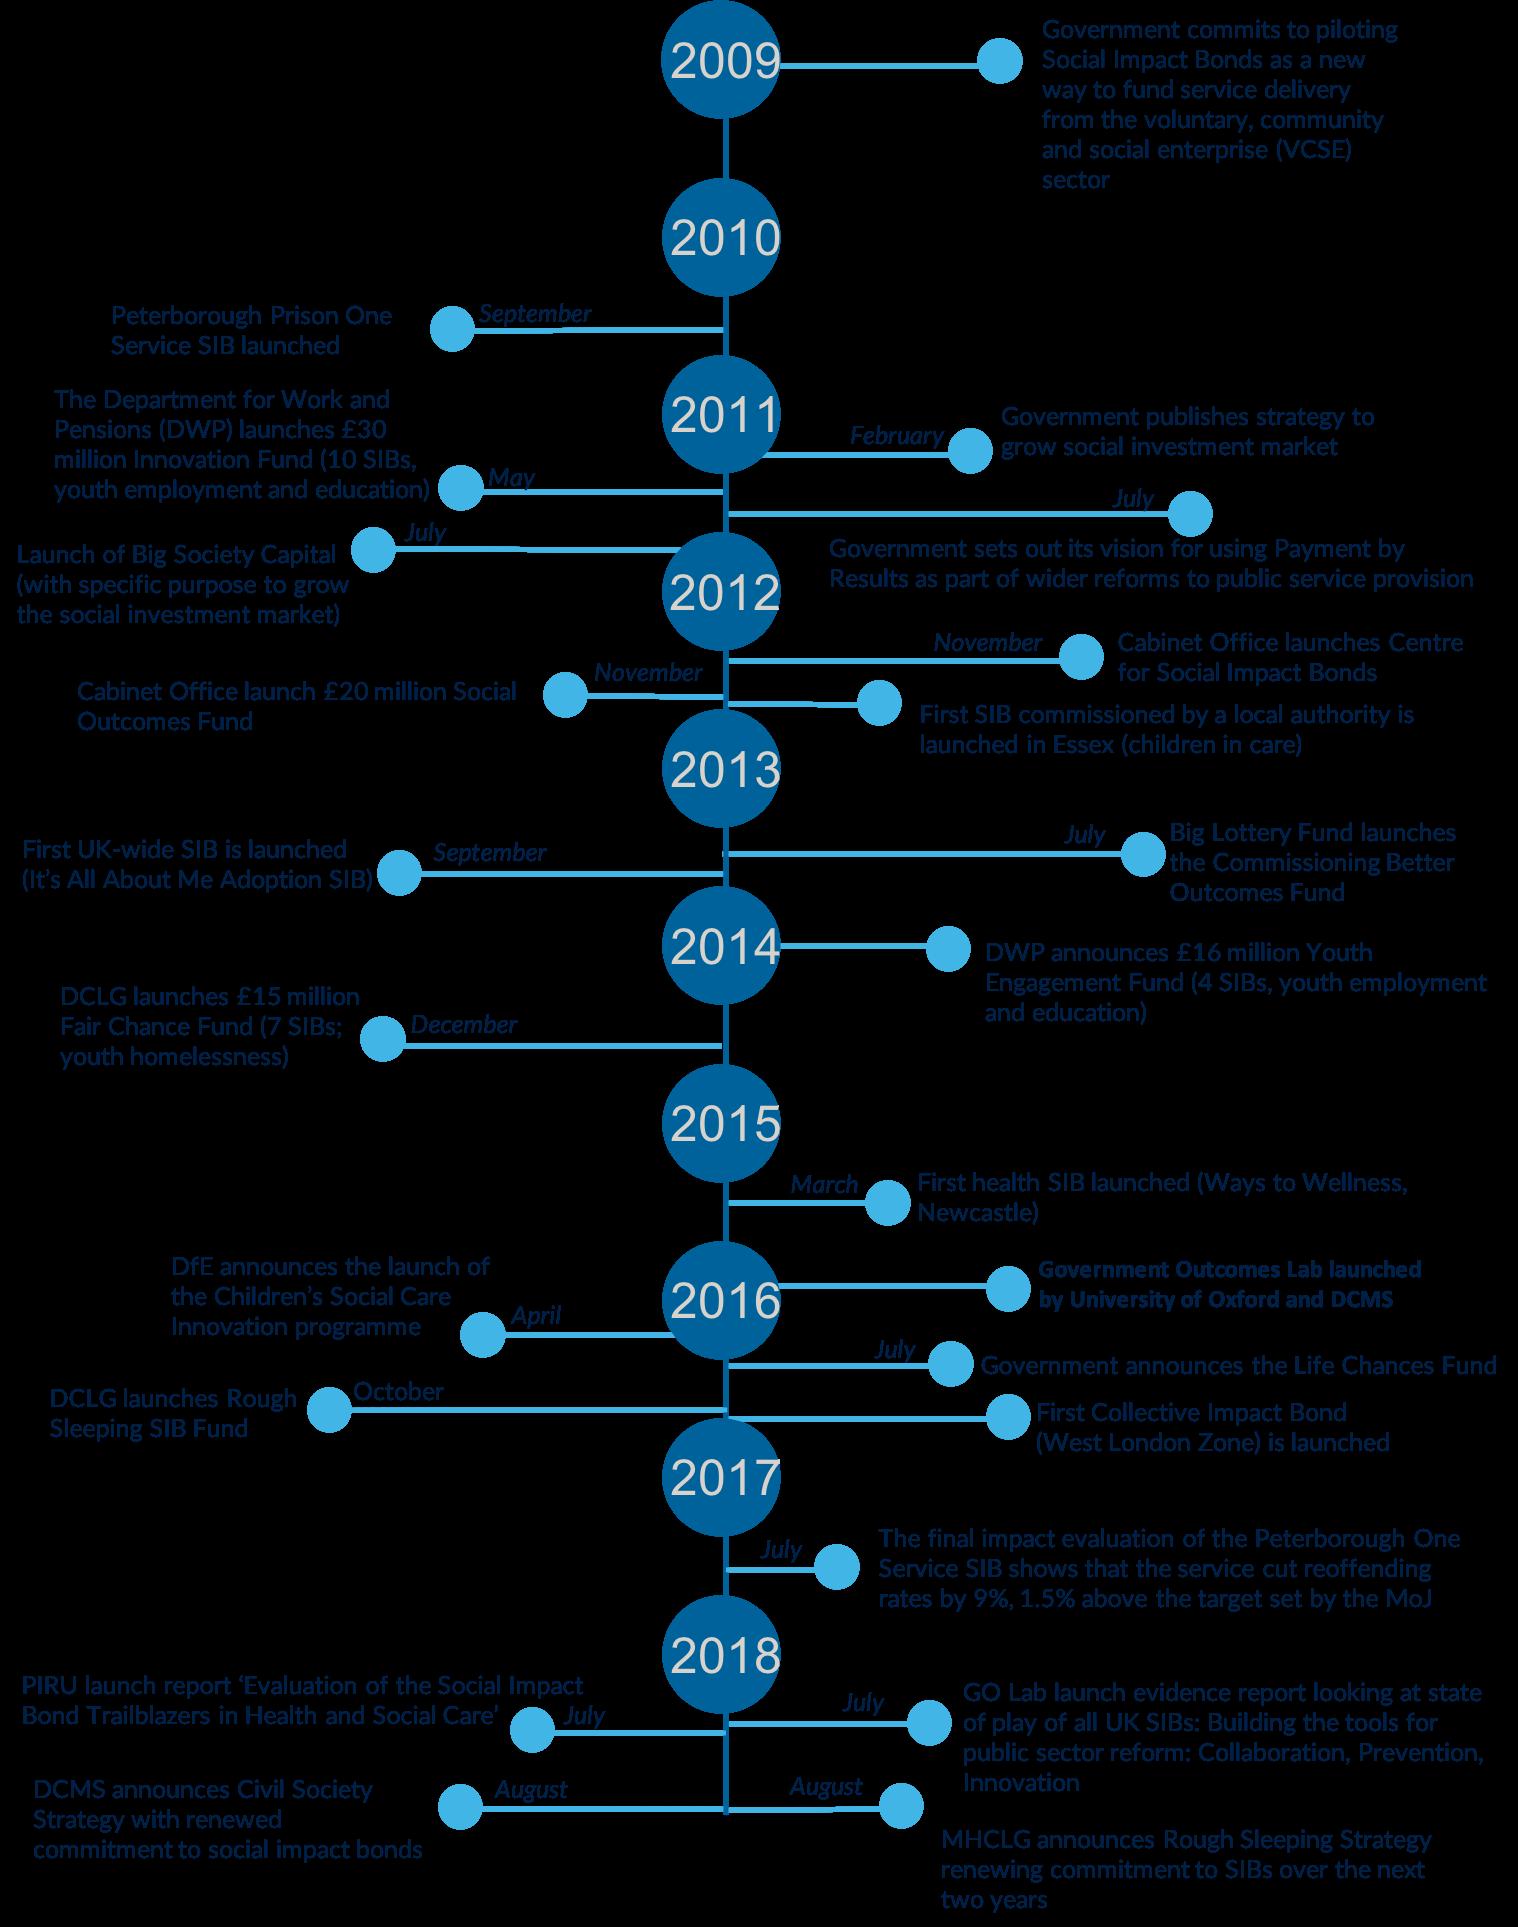 Figure 2: Timelines for the development of social impact bonds